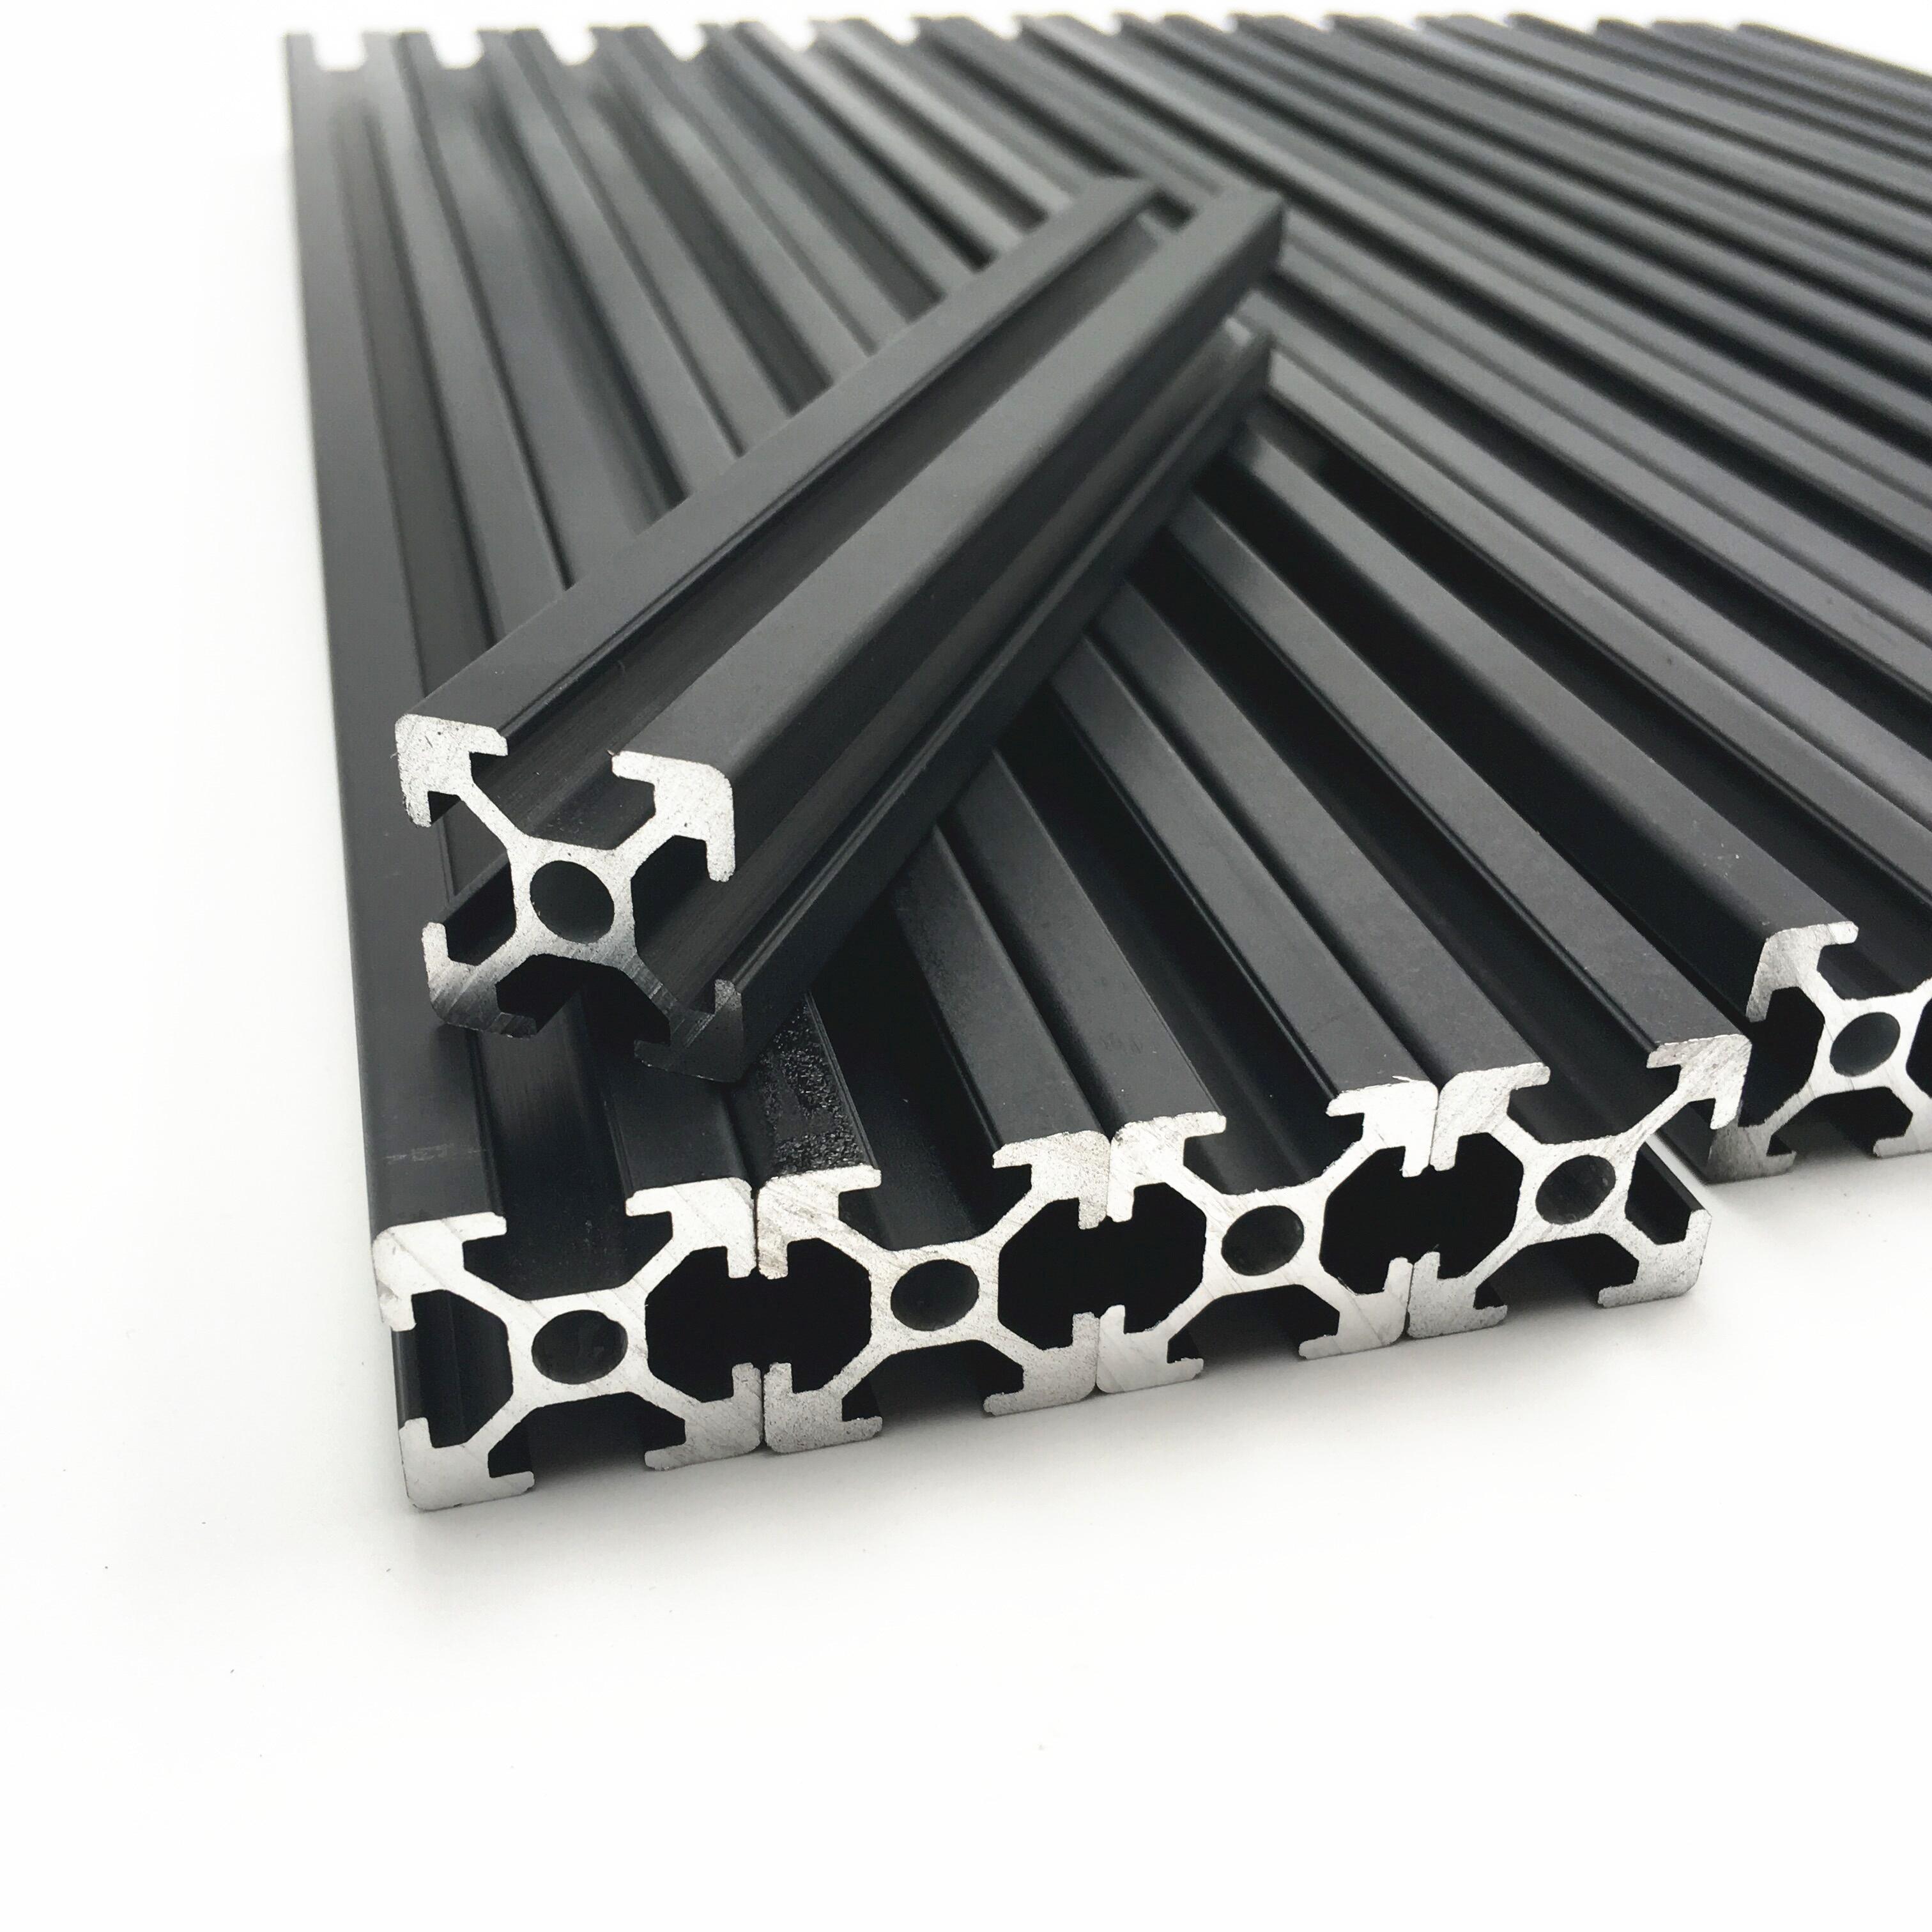 1Set Hypercube 3D Printer  Metal Frame Extrusion & Hardware Kit For DIY HyperCube 3D Printer  X200 x Y200 x Z155 print bed area